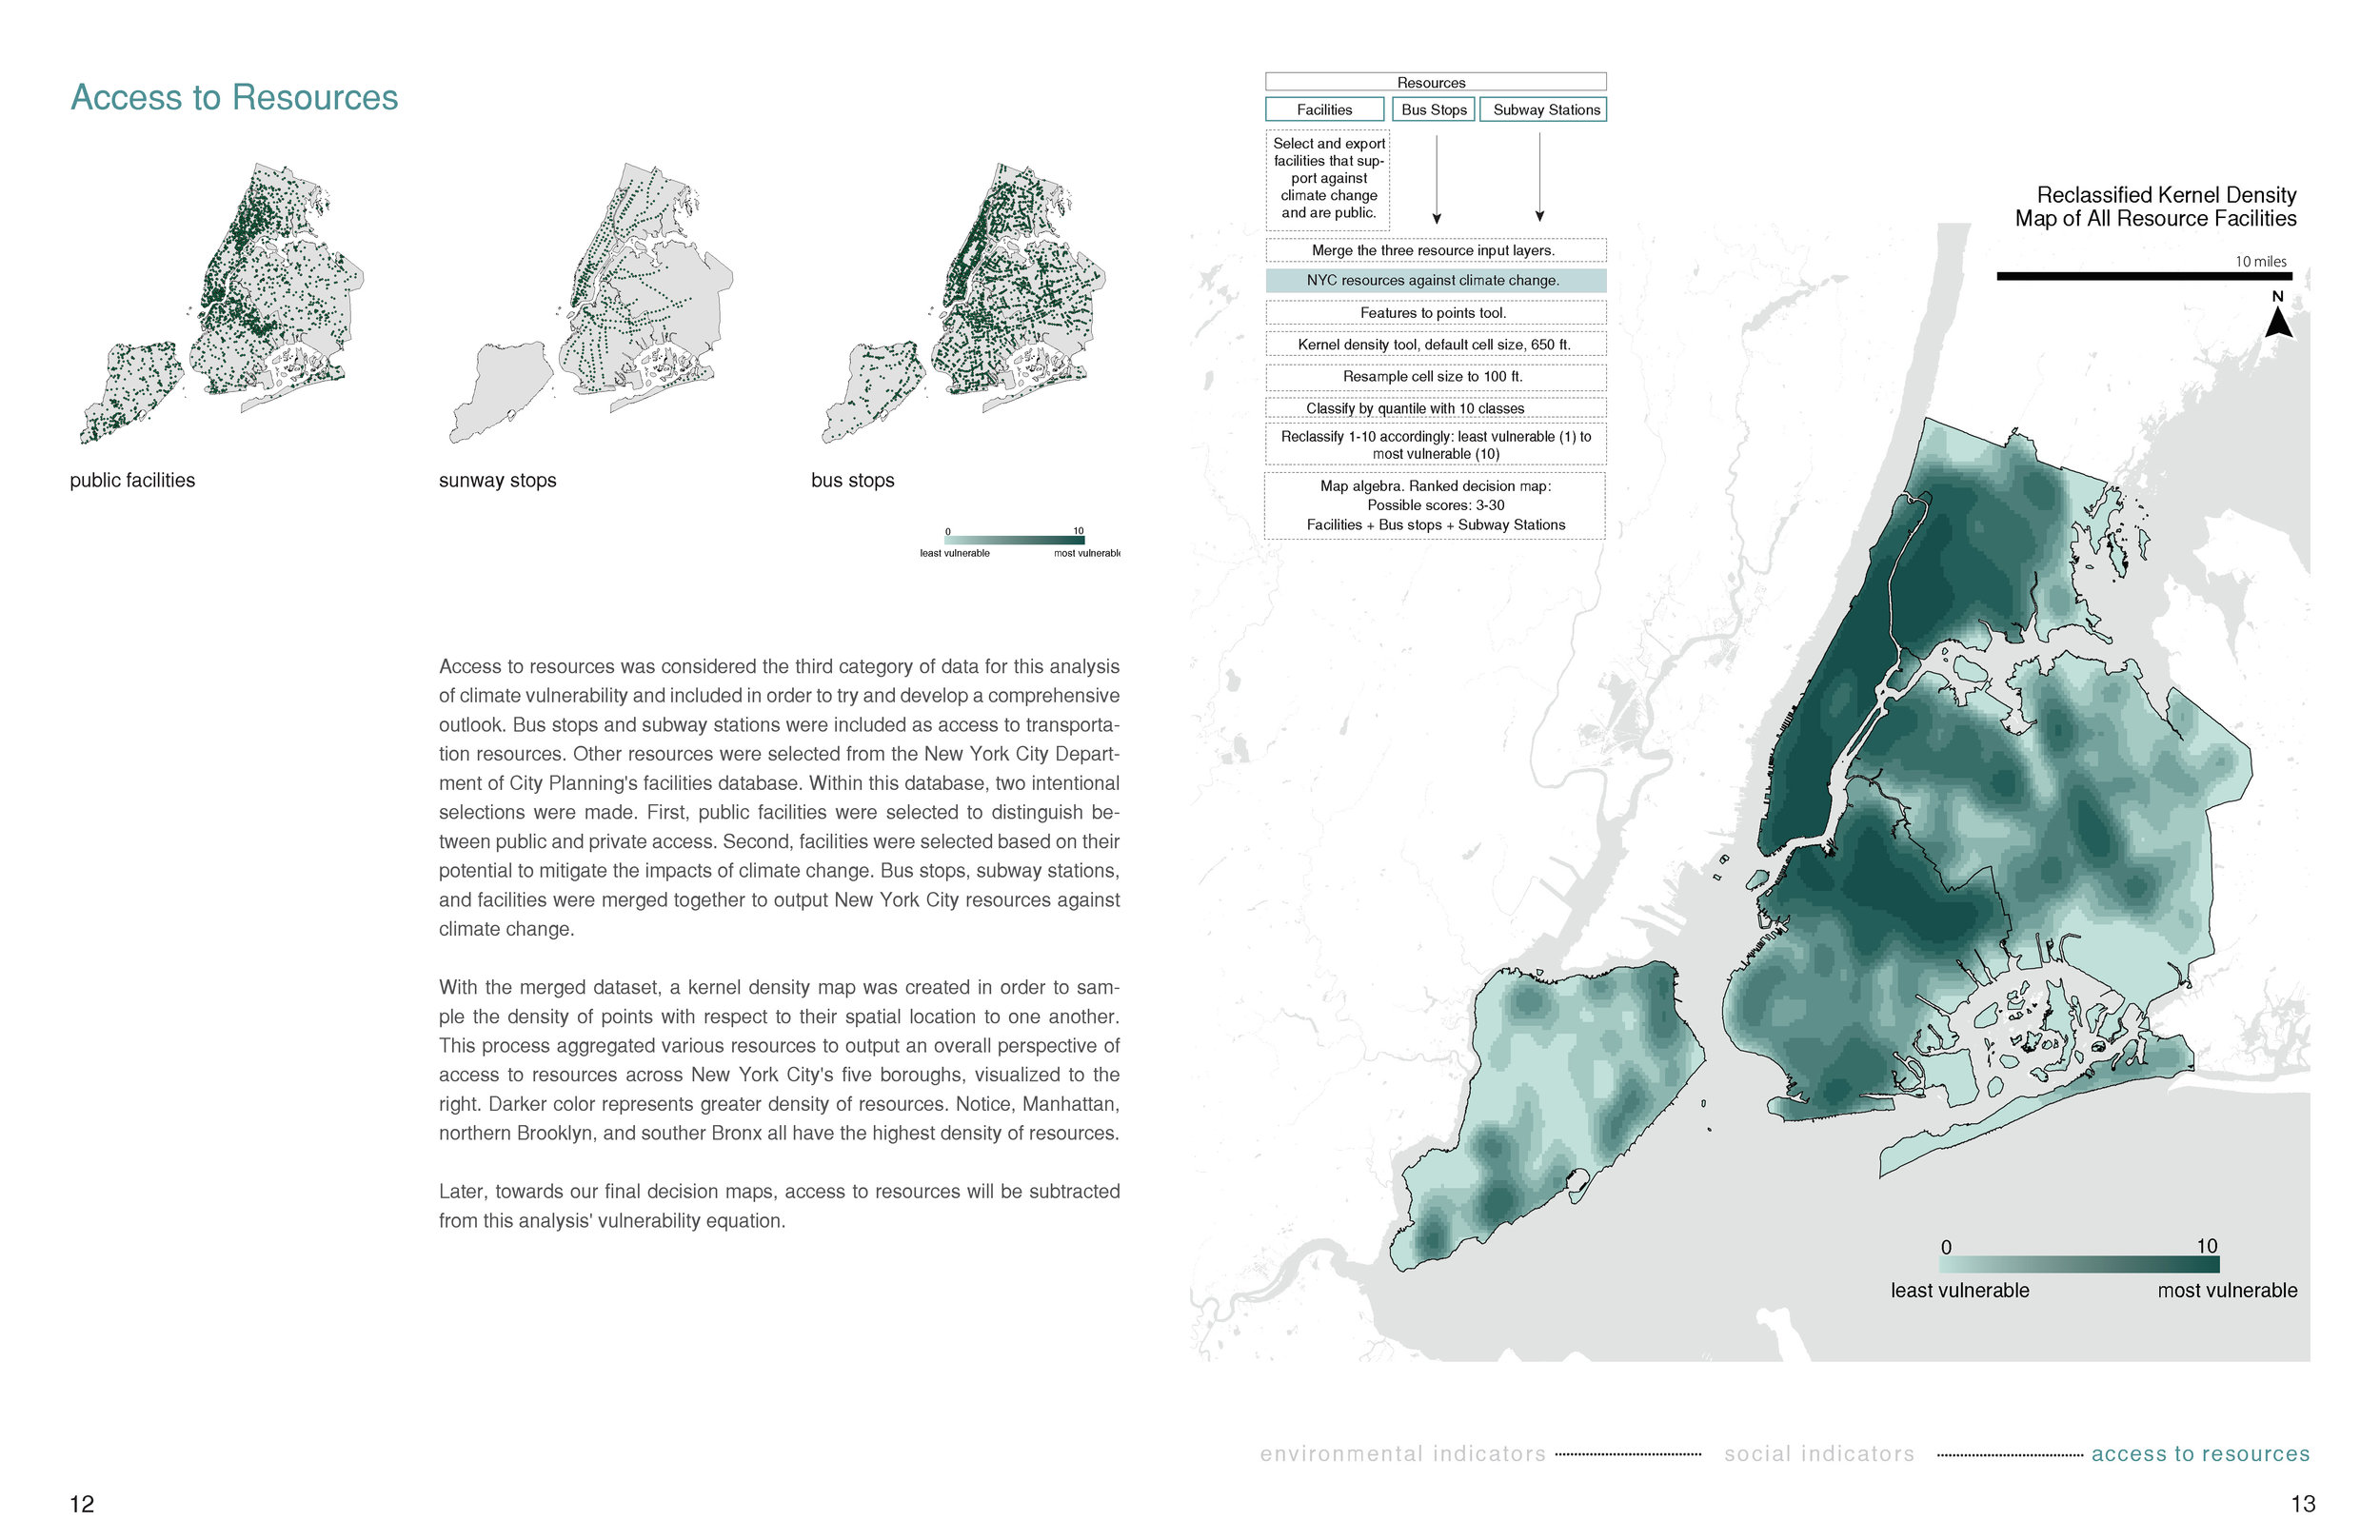 ClimateChangeVulnerability_P16-17.jpg